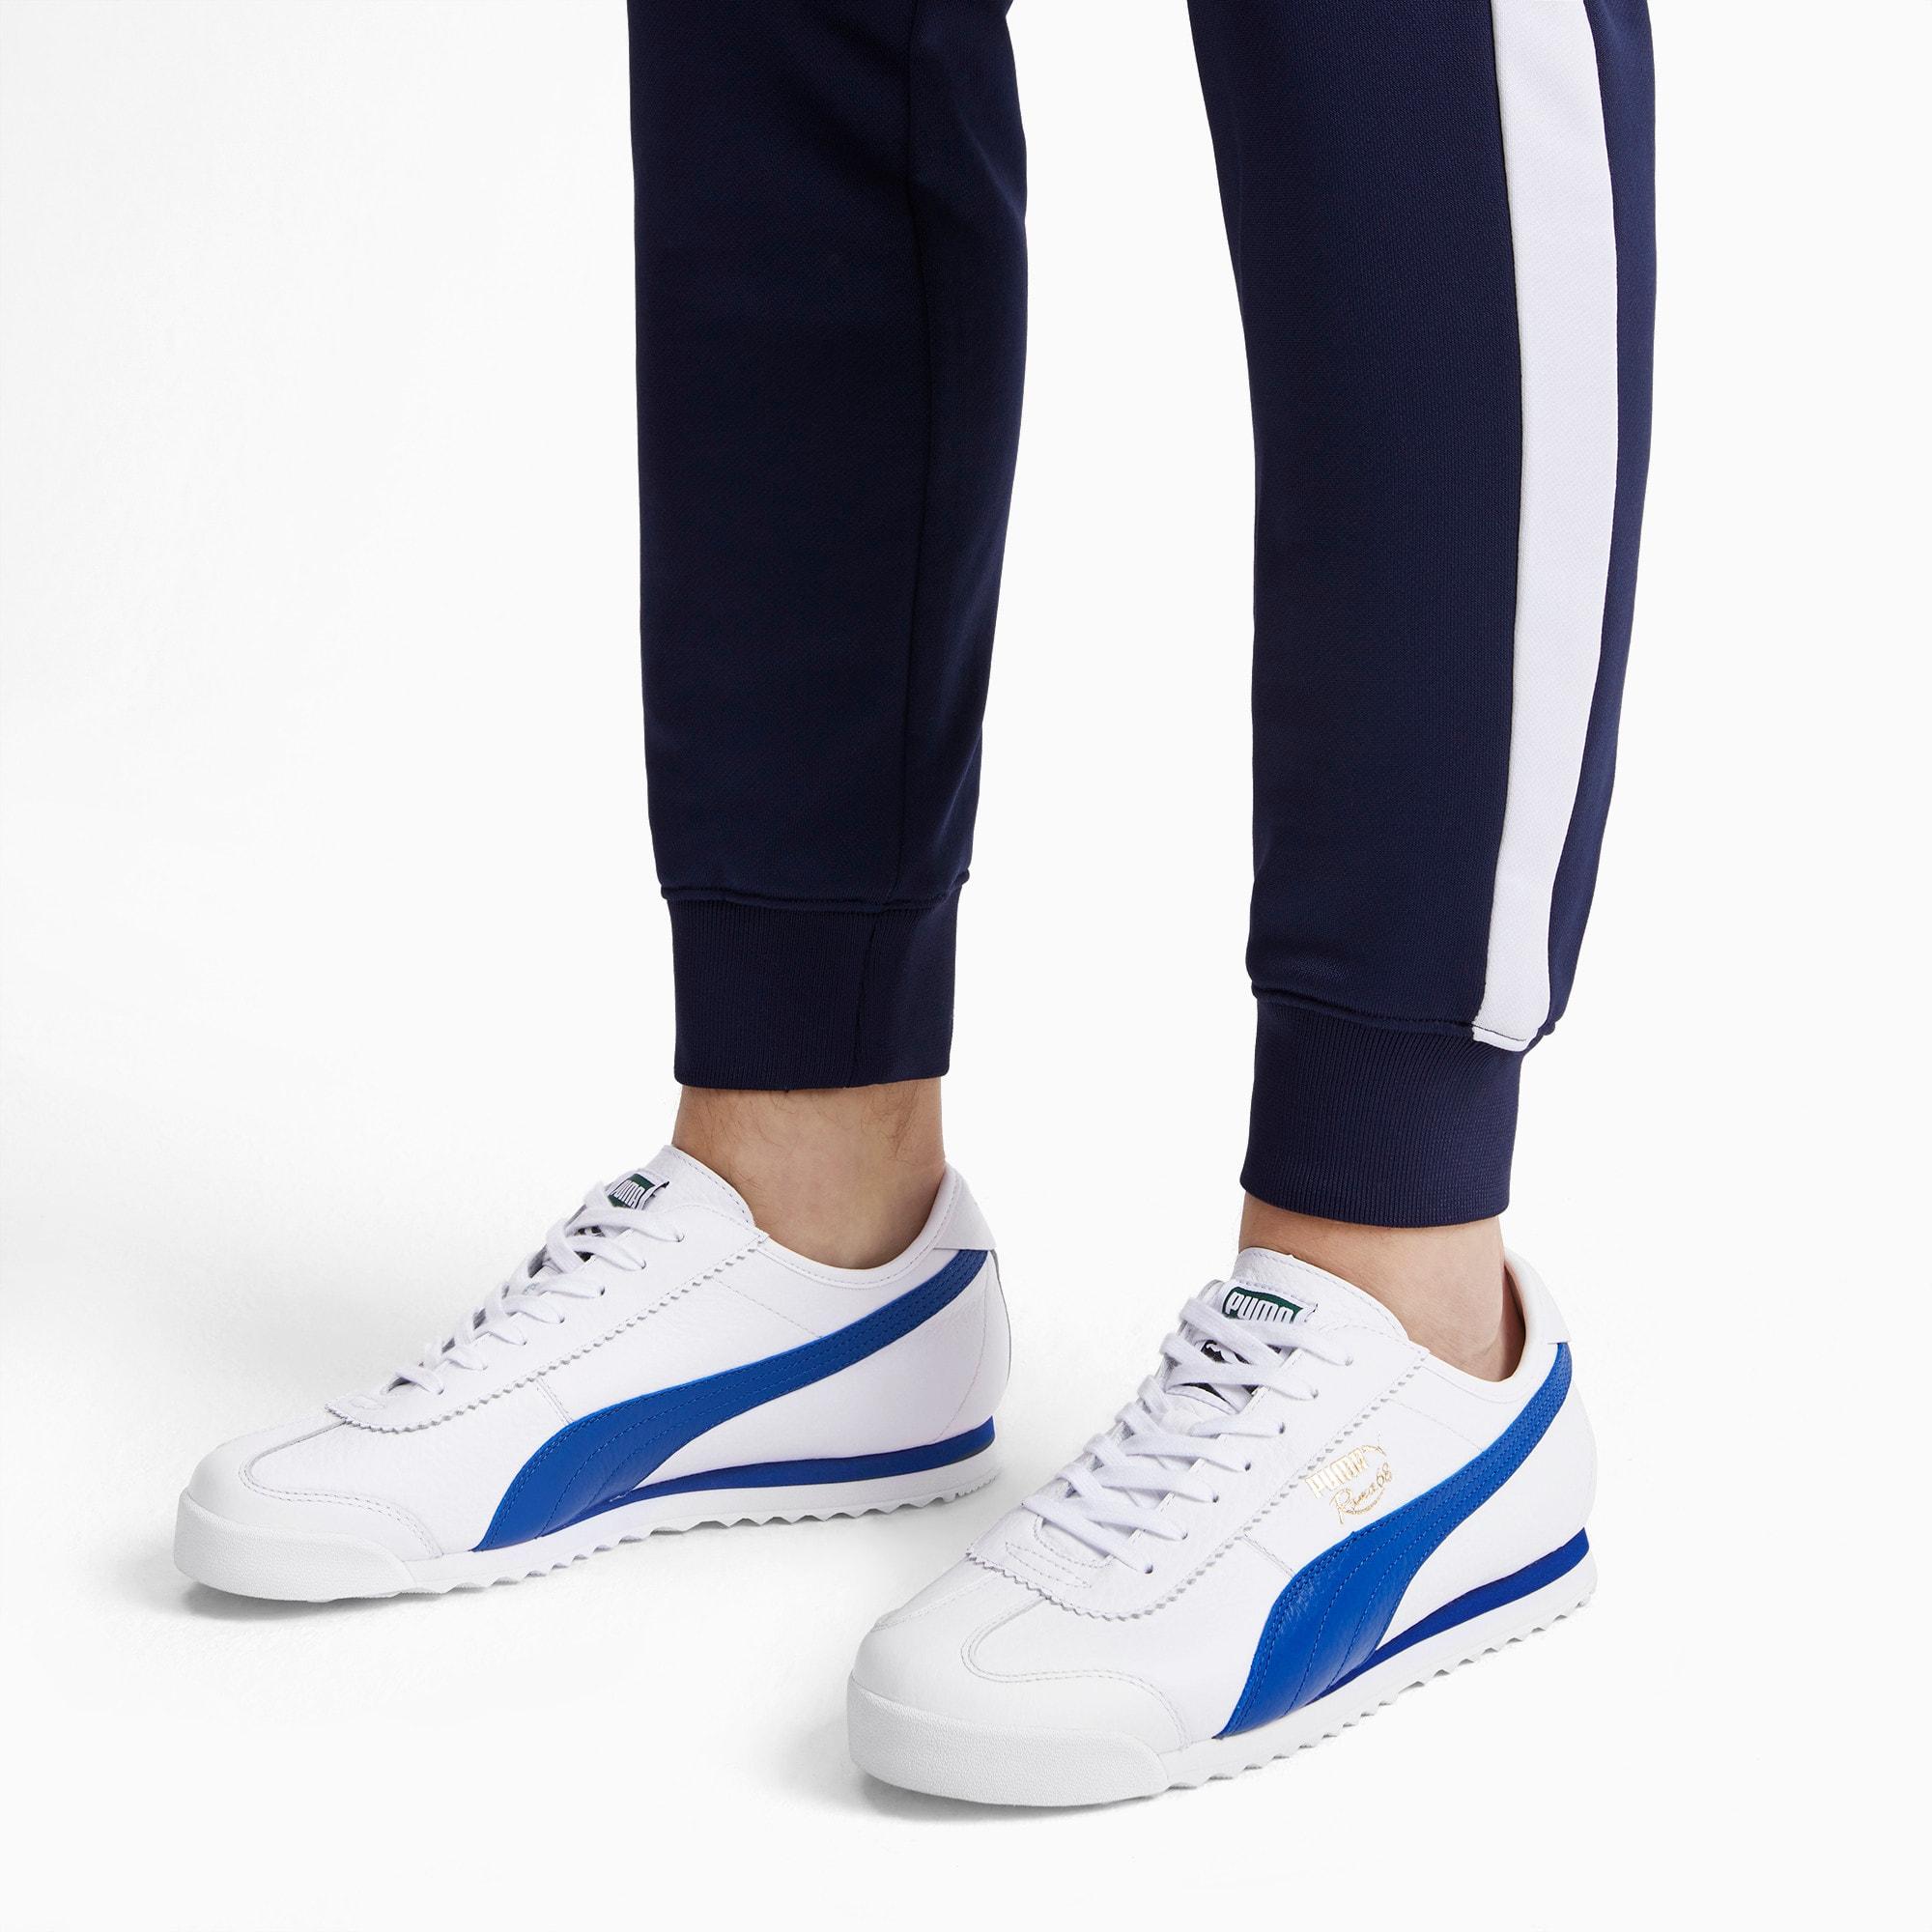 Miniatura 3 de Zapatos deportivos Roma '68 Vintage, Puma White-Galaxy Blue, mediano